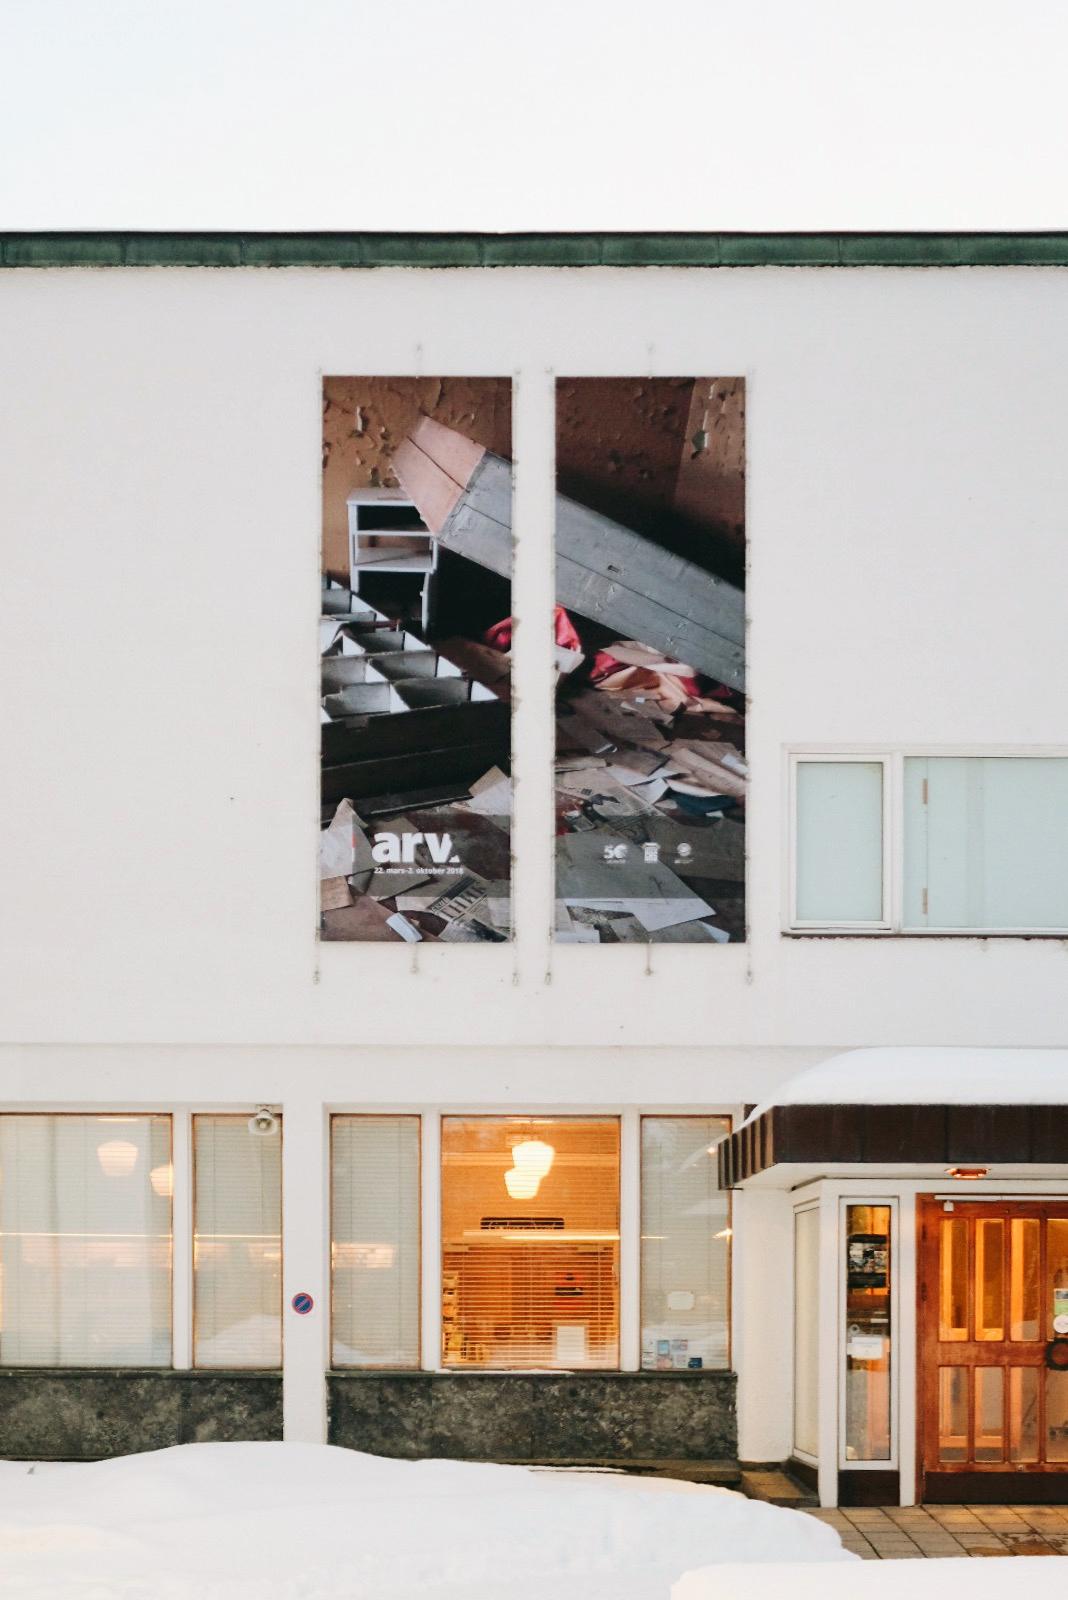 jsigharas-arv-exhibition-00.JPG